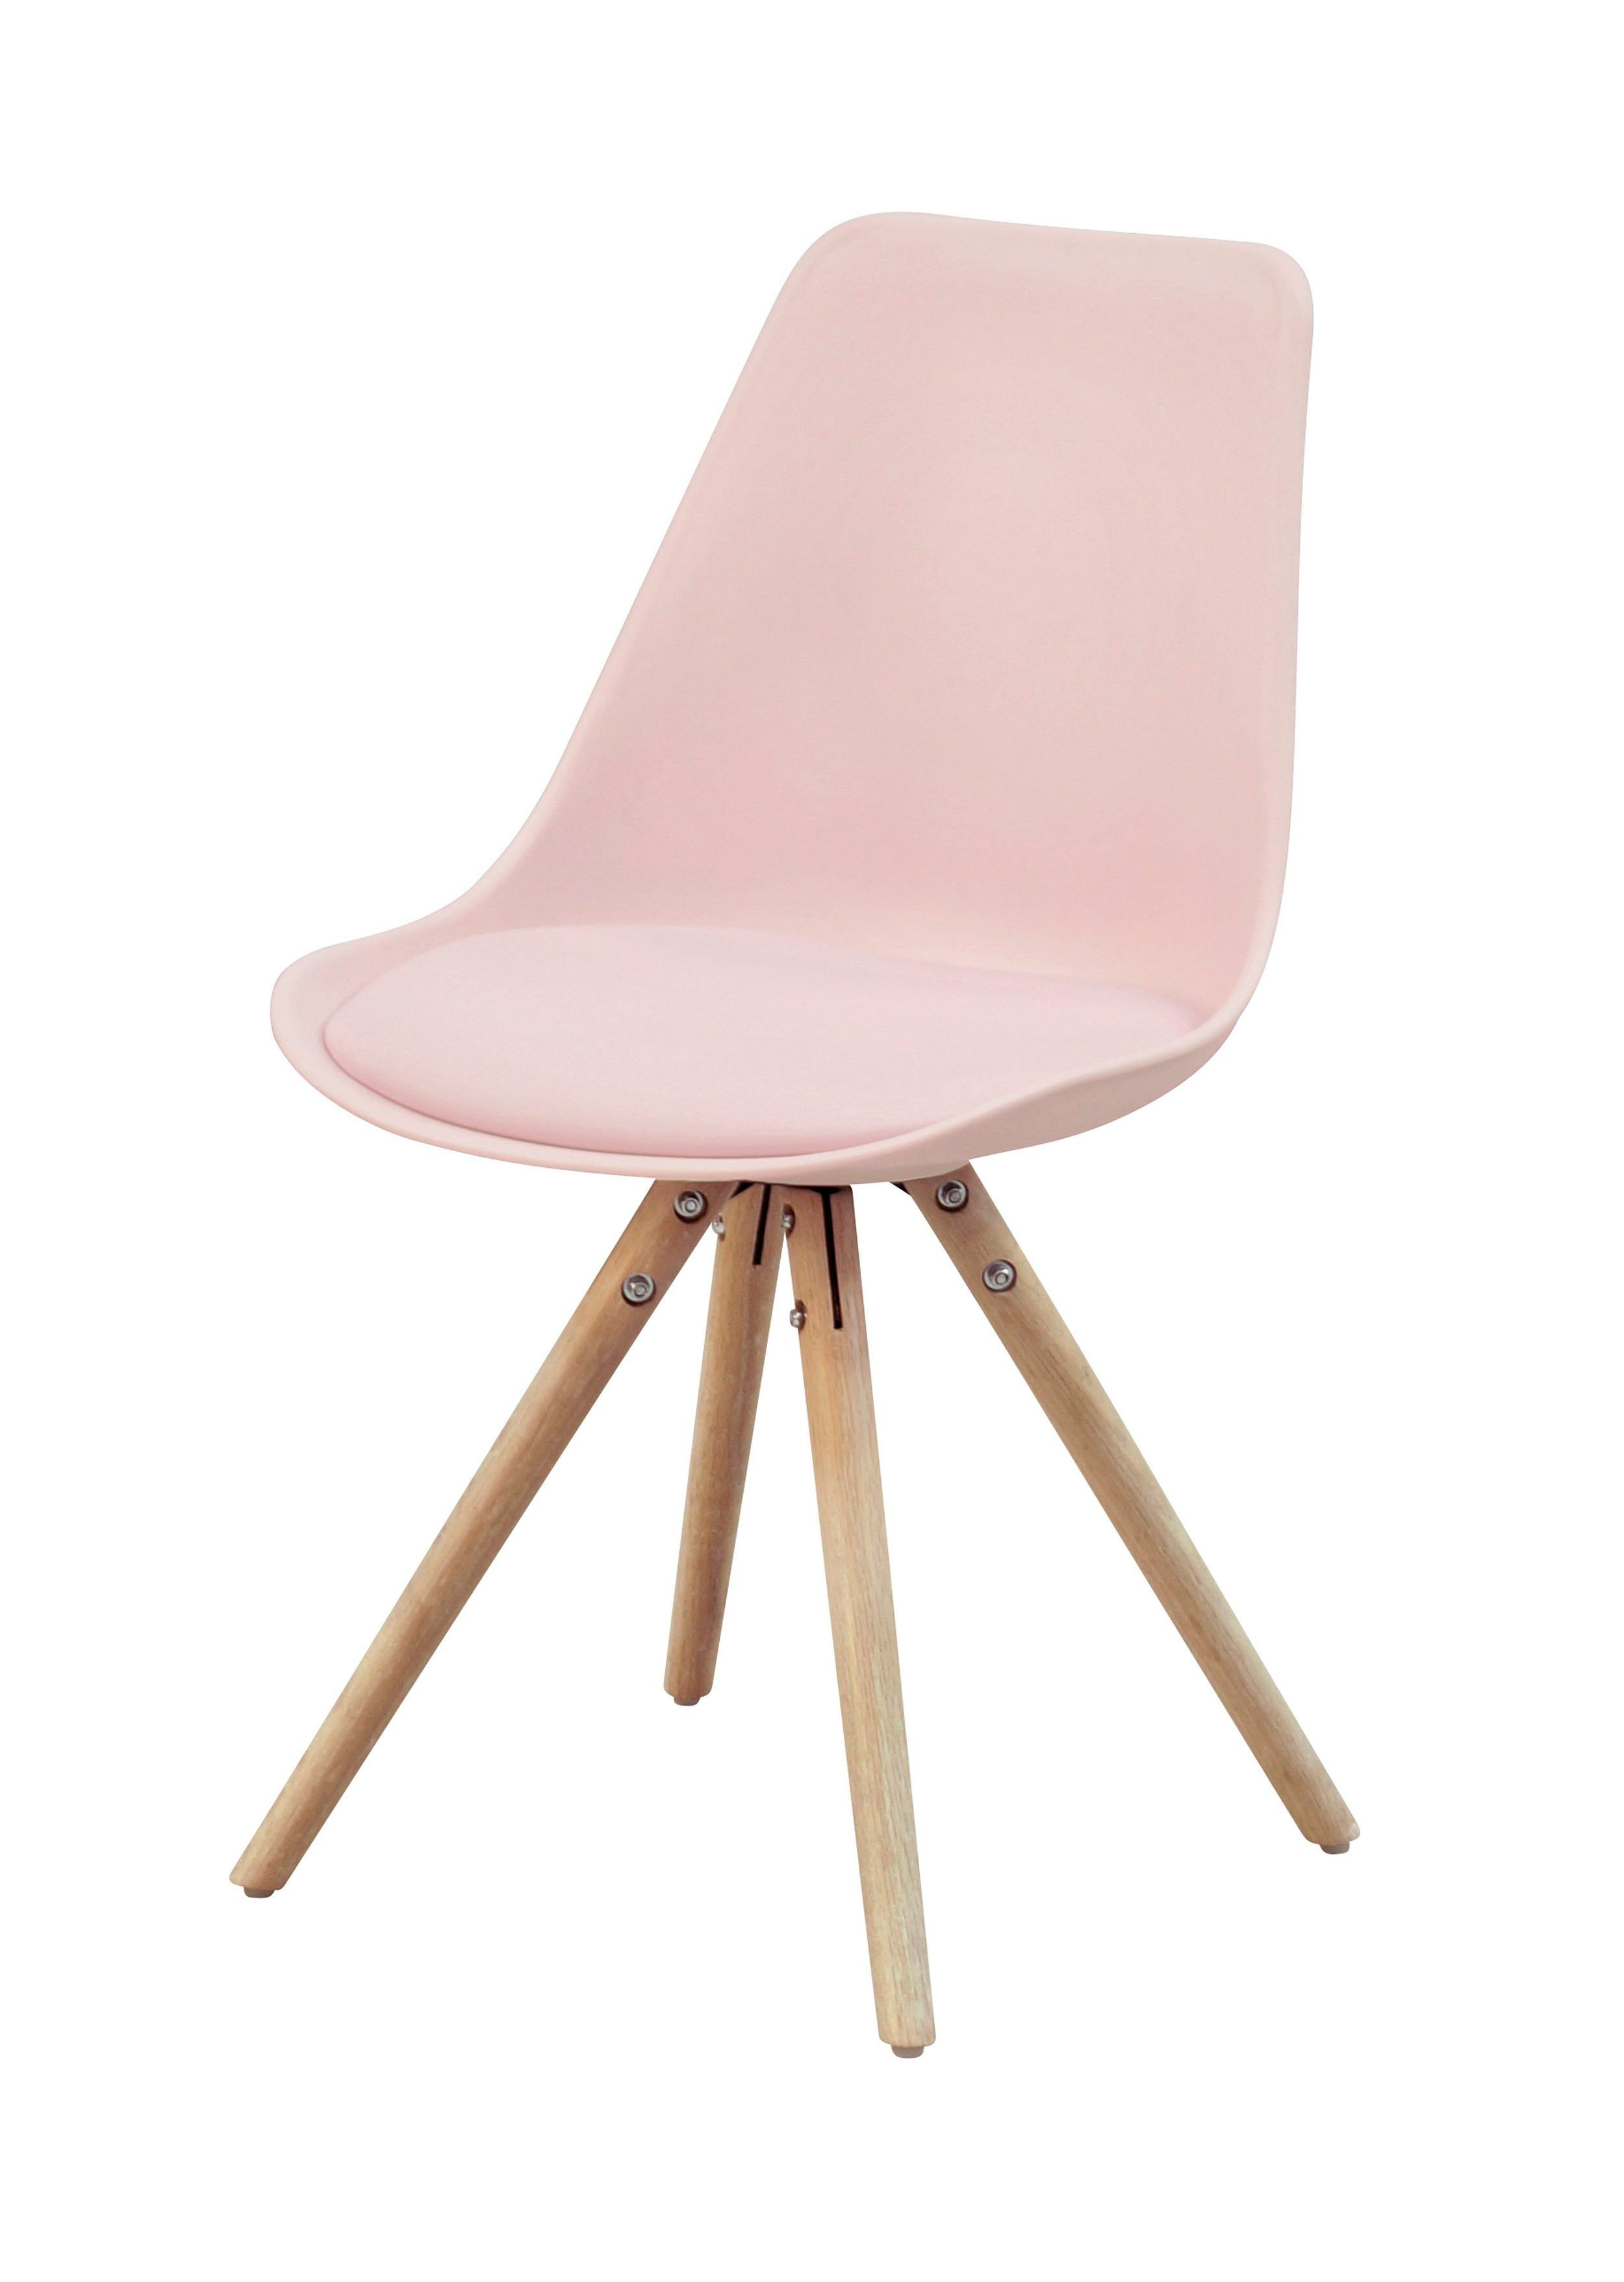 0ef2795eec2f4347a9e890a7a64d7190 Incroyable De Table Basse Pliante but Concept